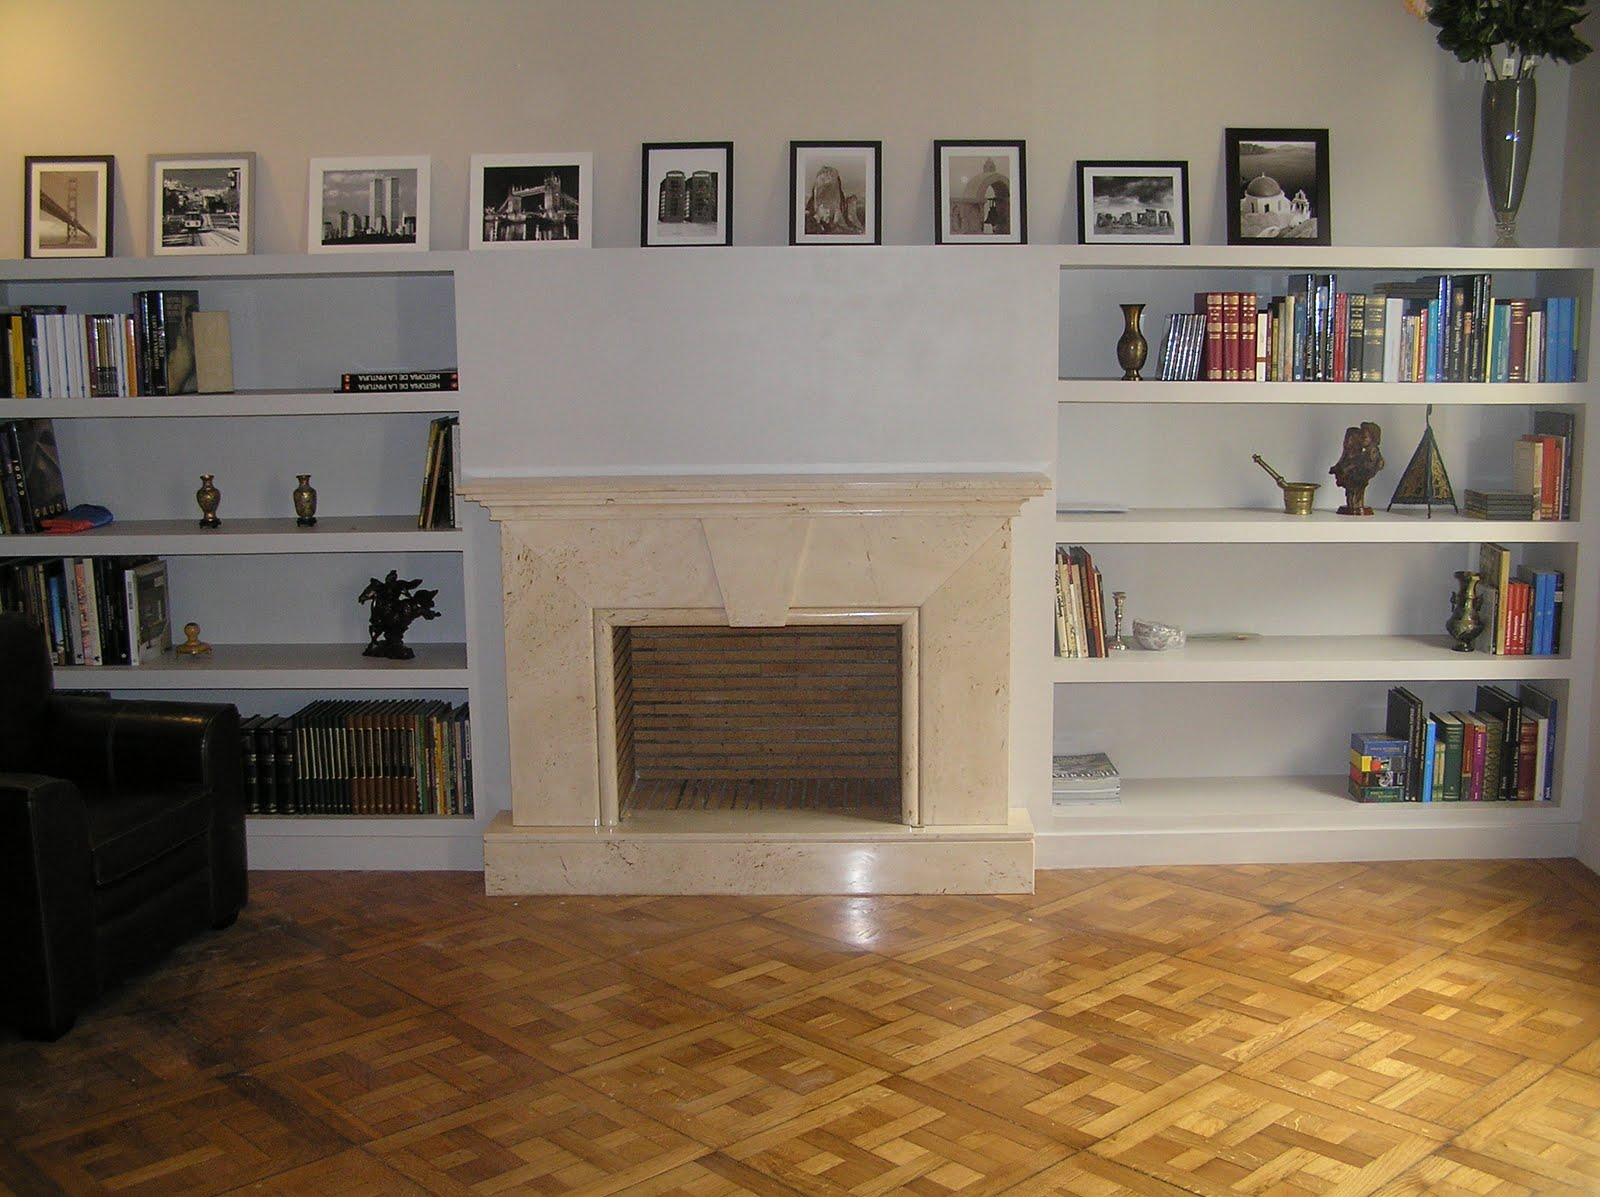 Reformas barcelona stanley 698 372 093 mueble de pladur con chimenea - Muebles para chimenea ...